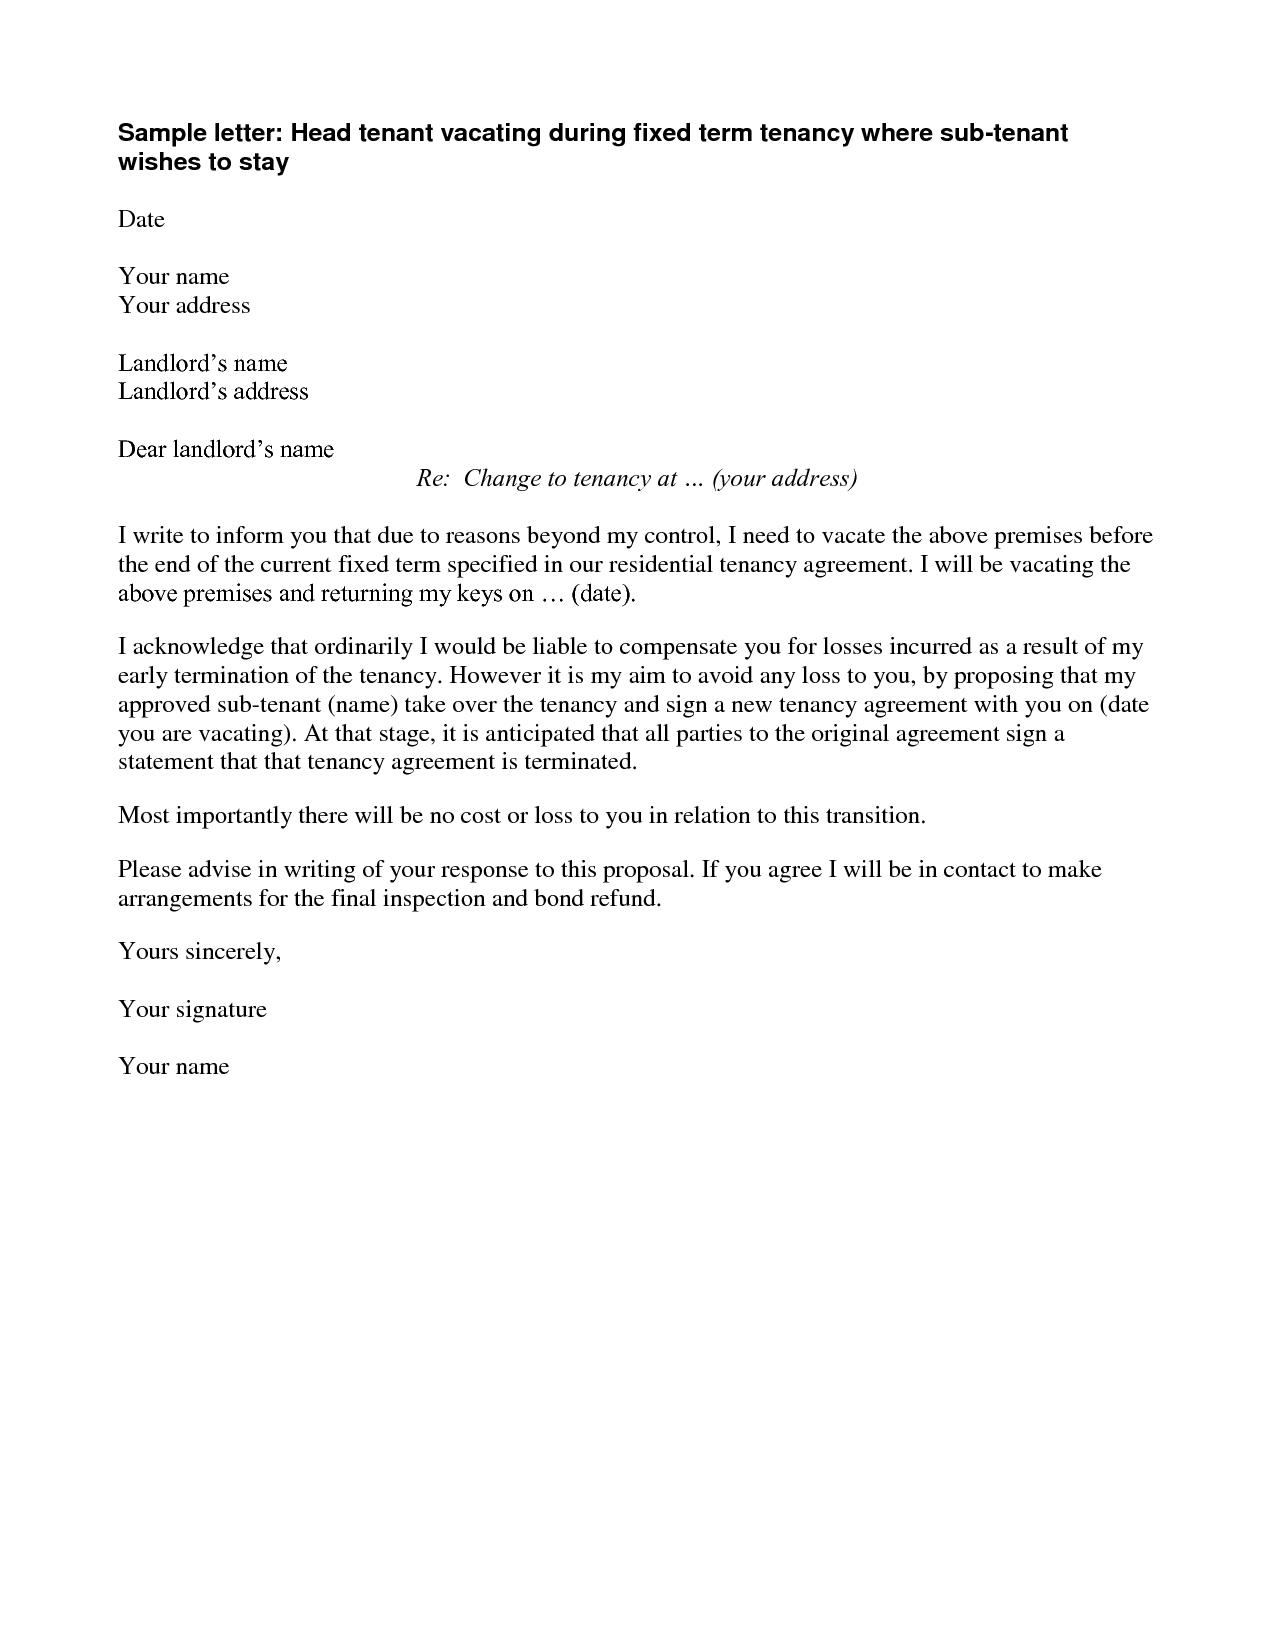 Terminate Business Relationship Letter Sample